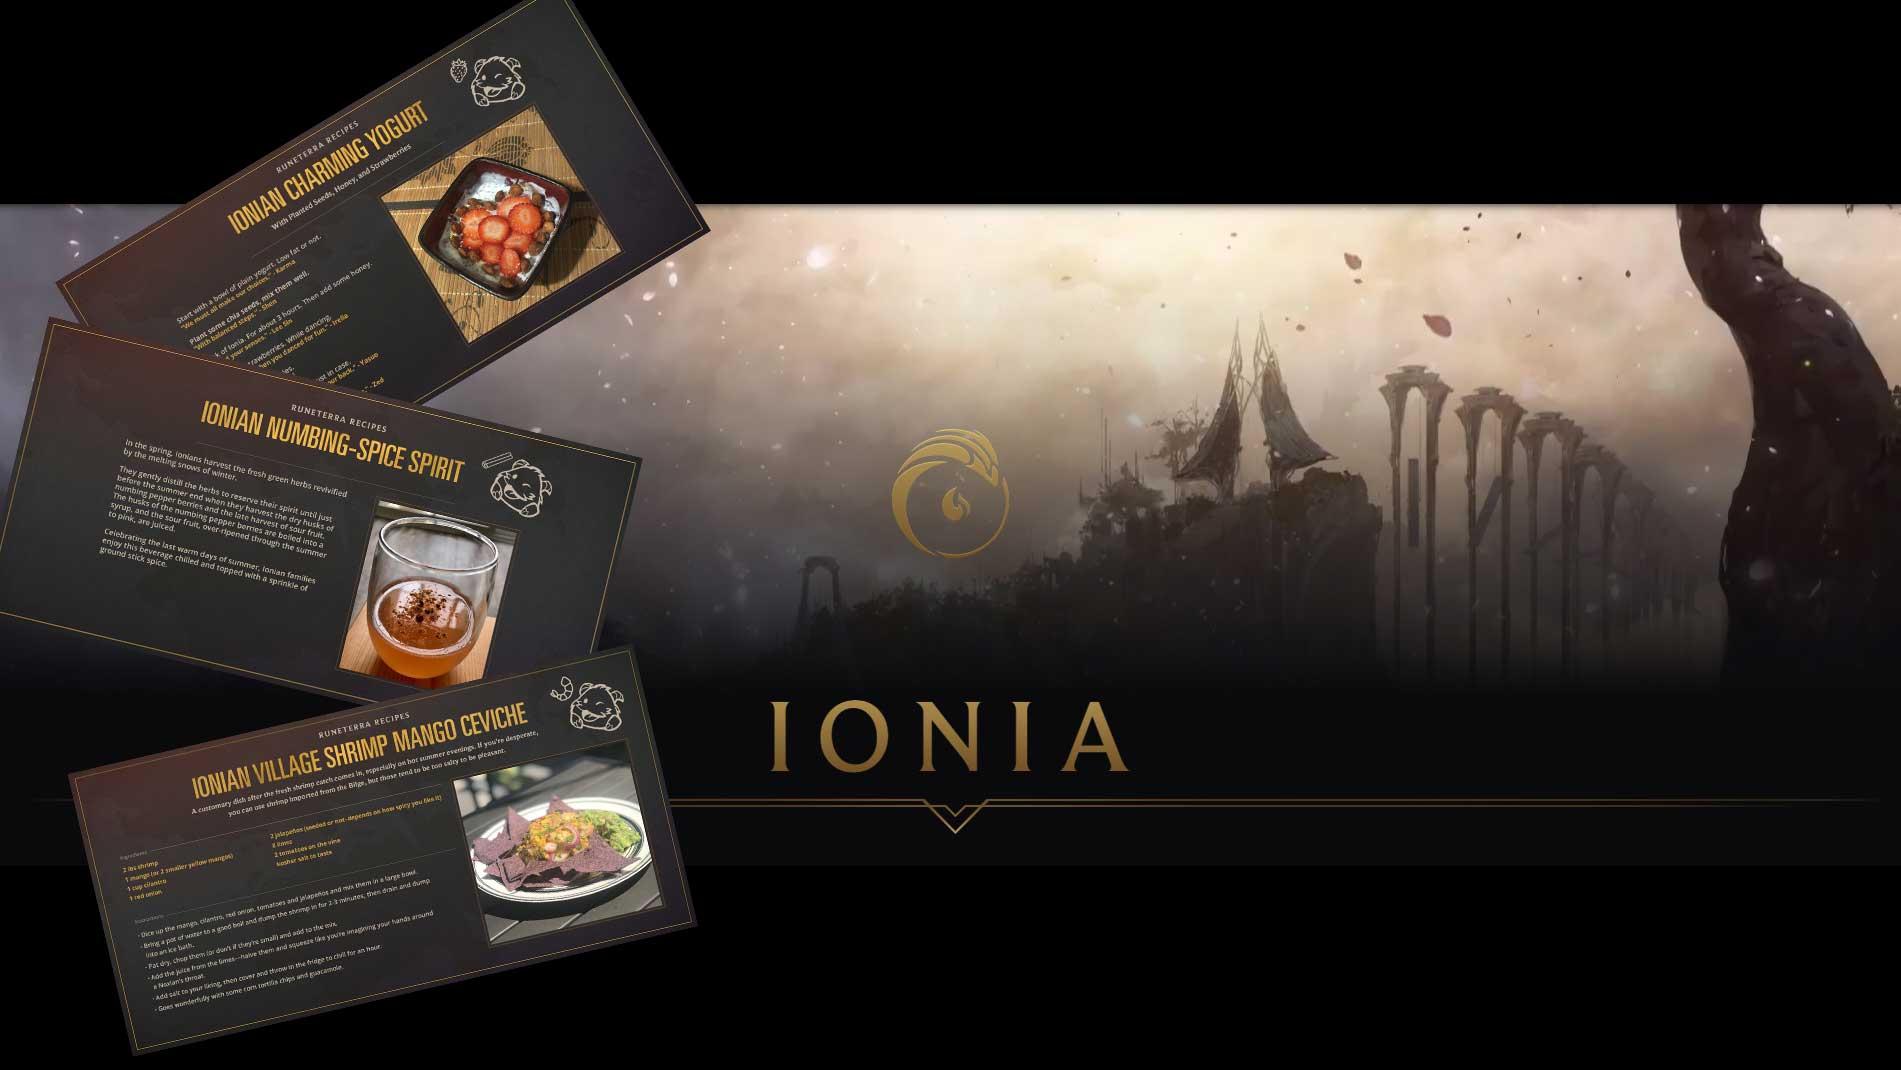 Ionia banner babt